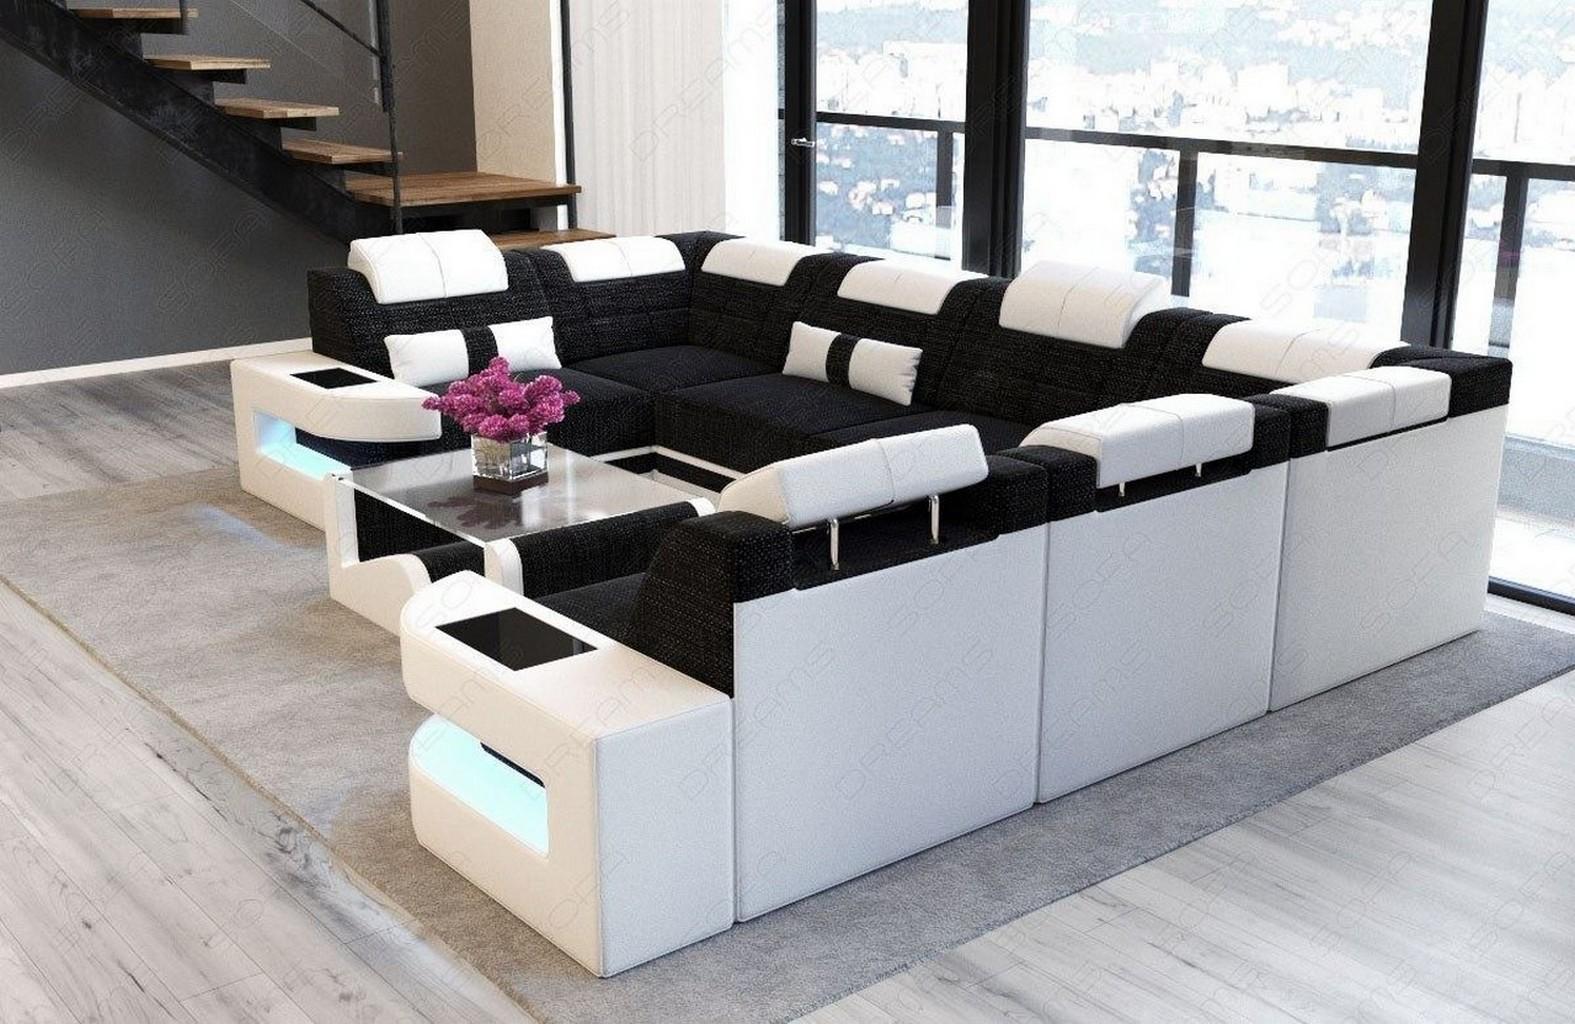 Designer luxus sofa wohnlandschaft como u polsterecke led for Luxus wohnlandschaft